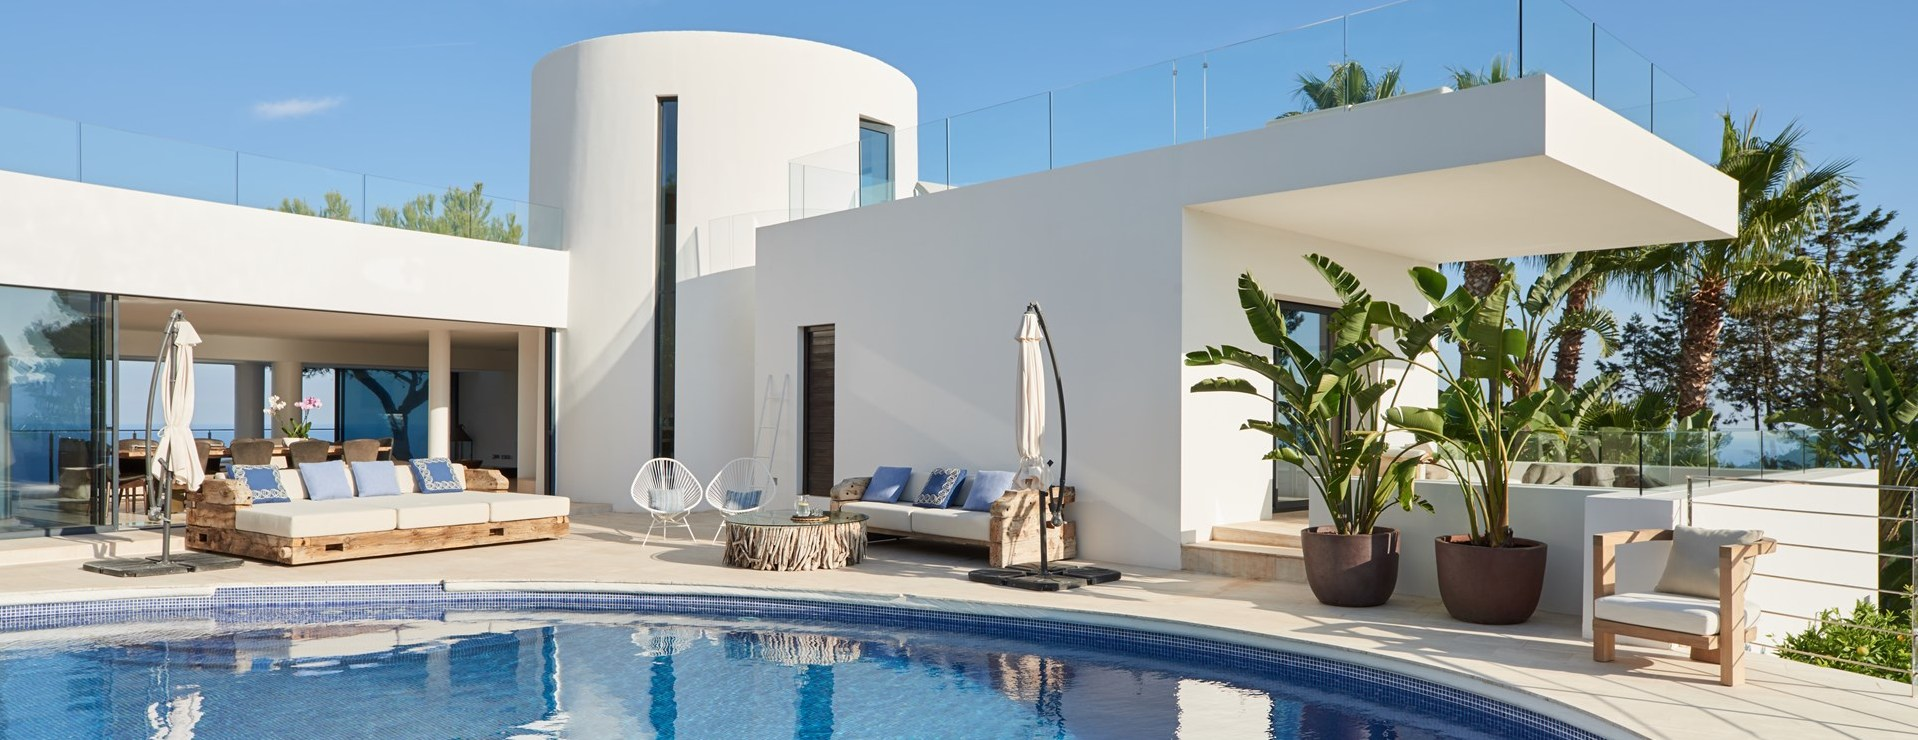 luxury-5-bedroom-villa-ibiza